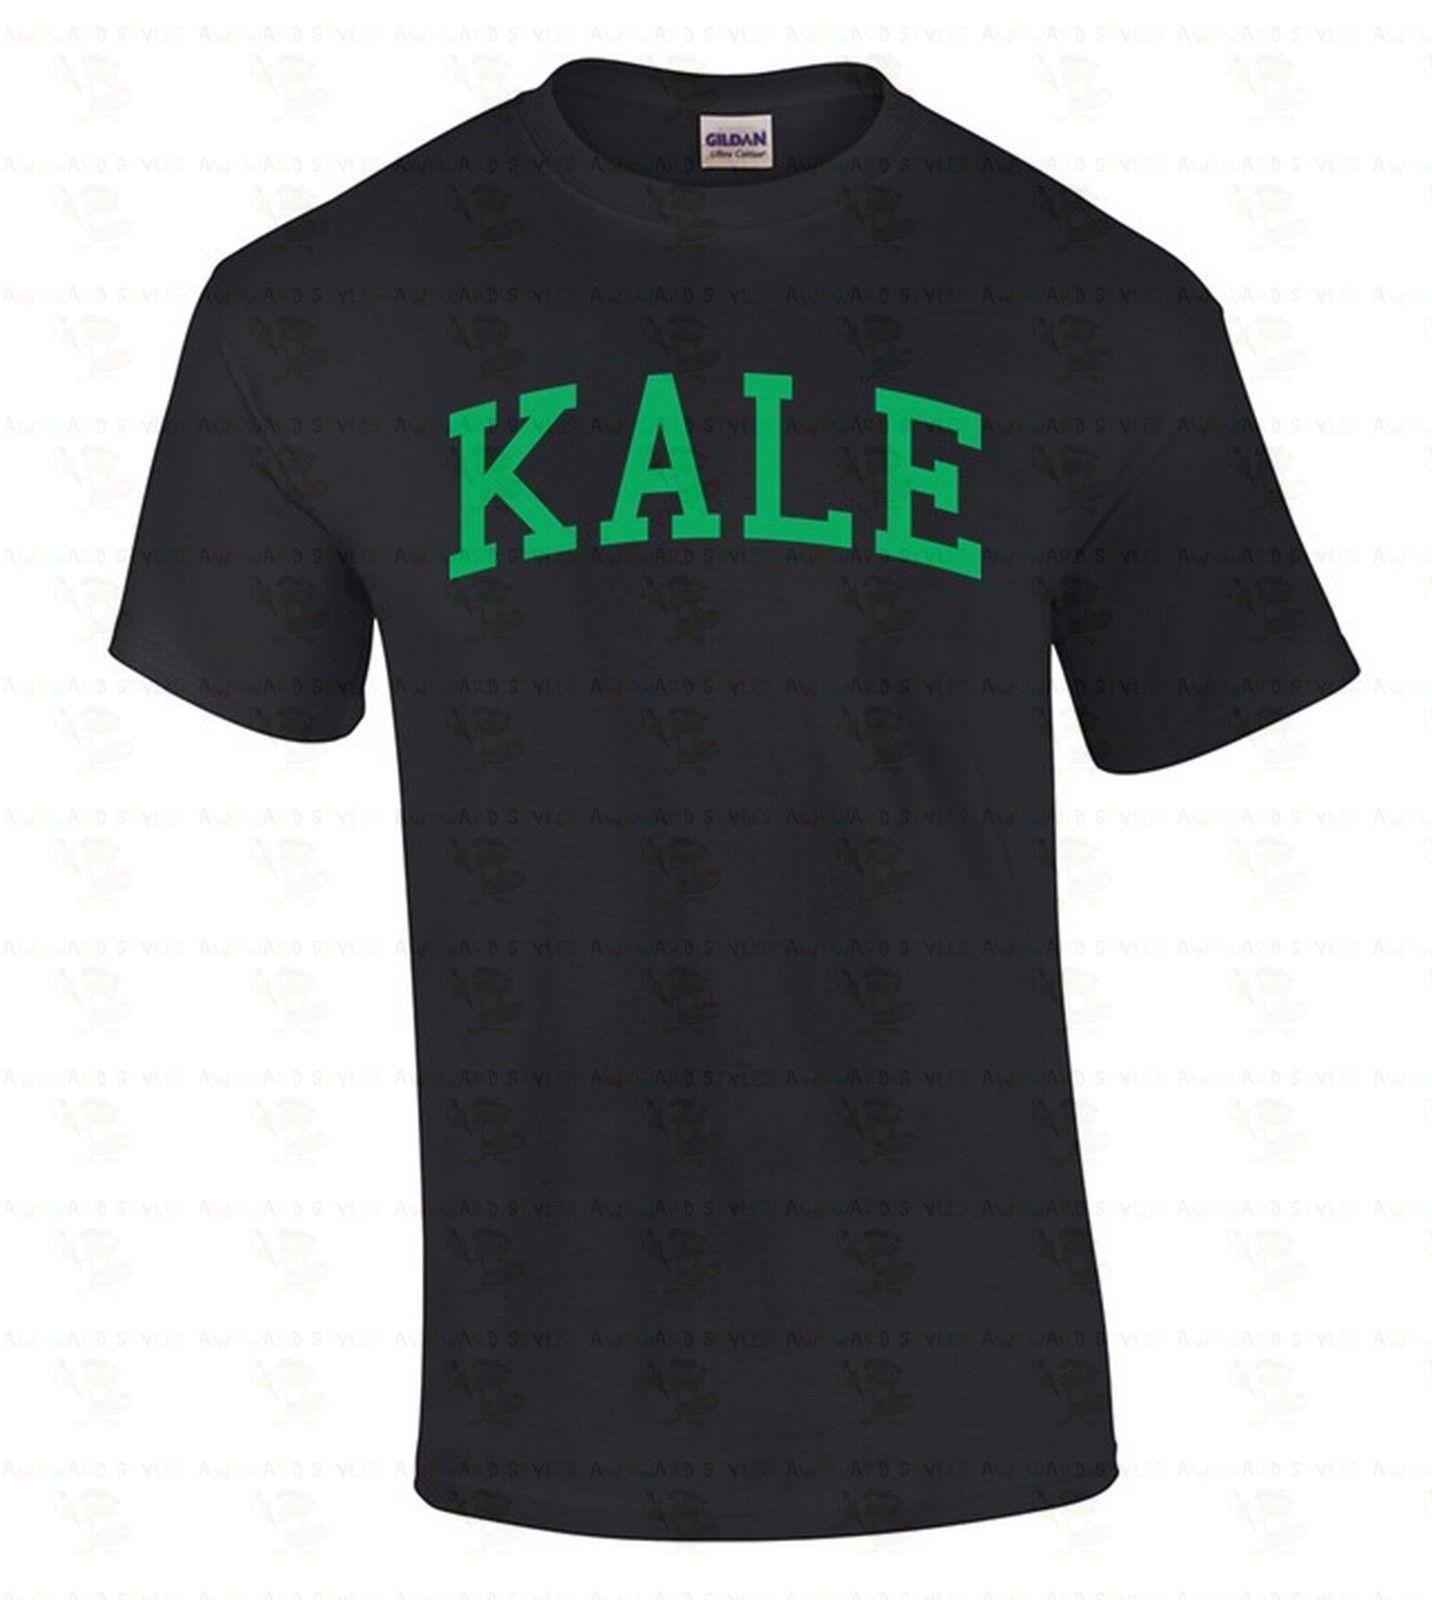 KALE MenS T SHIRT Vegan Organic GREEN Logo Birthday Gift Vegetarian Tee Shirt Comfortable Fabric Street Style Men Worlds Funniest Shirts Cool